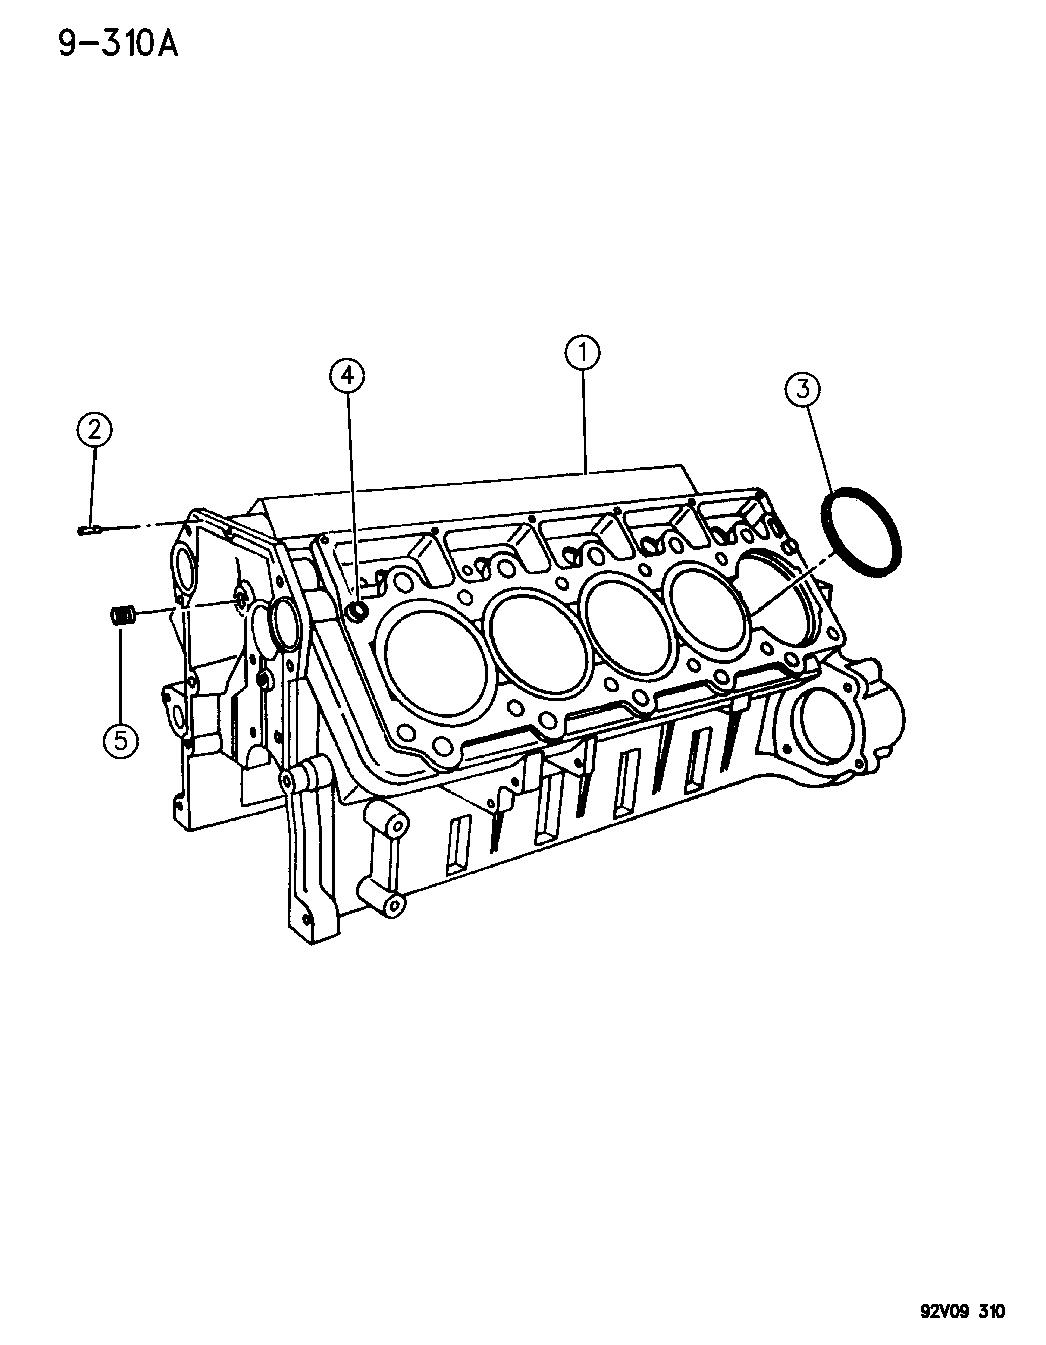 1993 Dodge Viper Cylinder Block